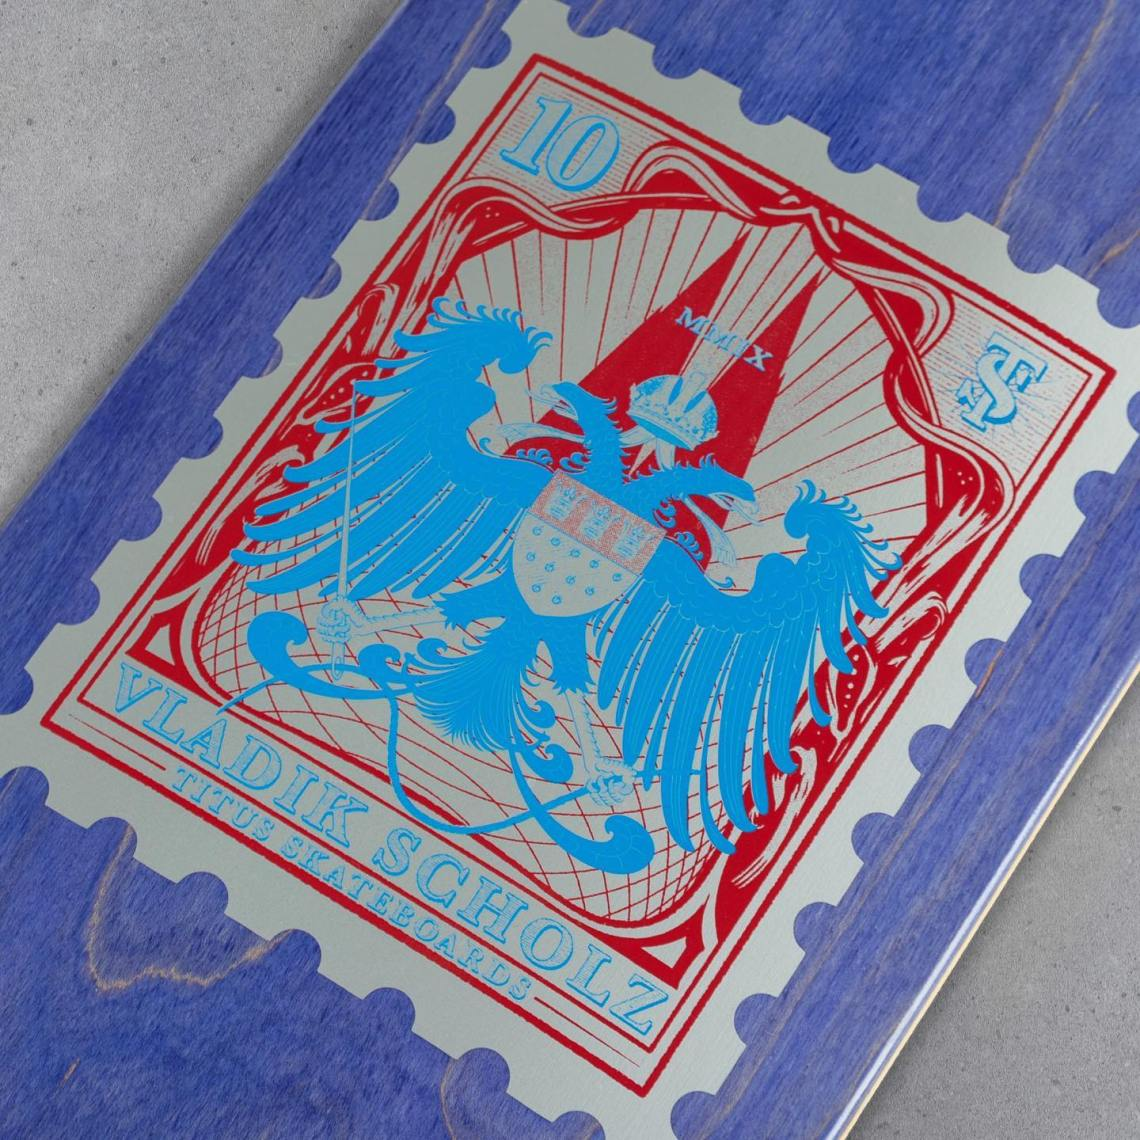 10 YRS Series Par Vast Studio X Titus Skateboards 2